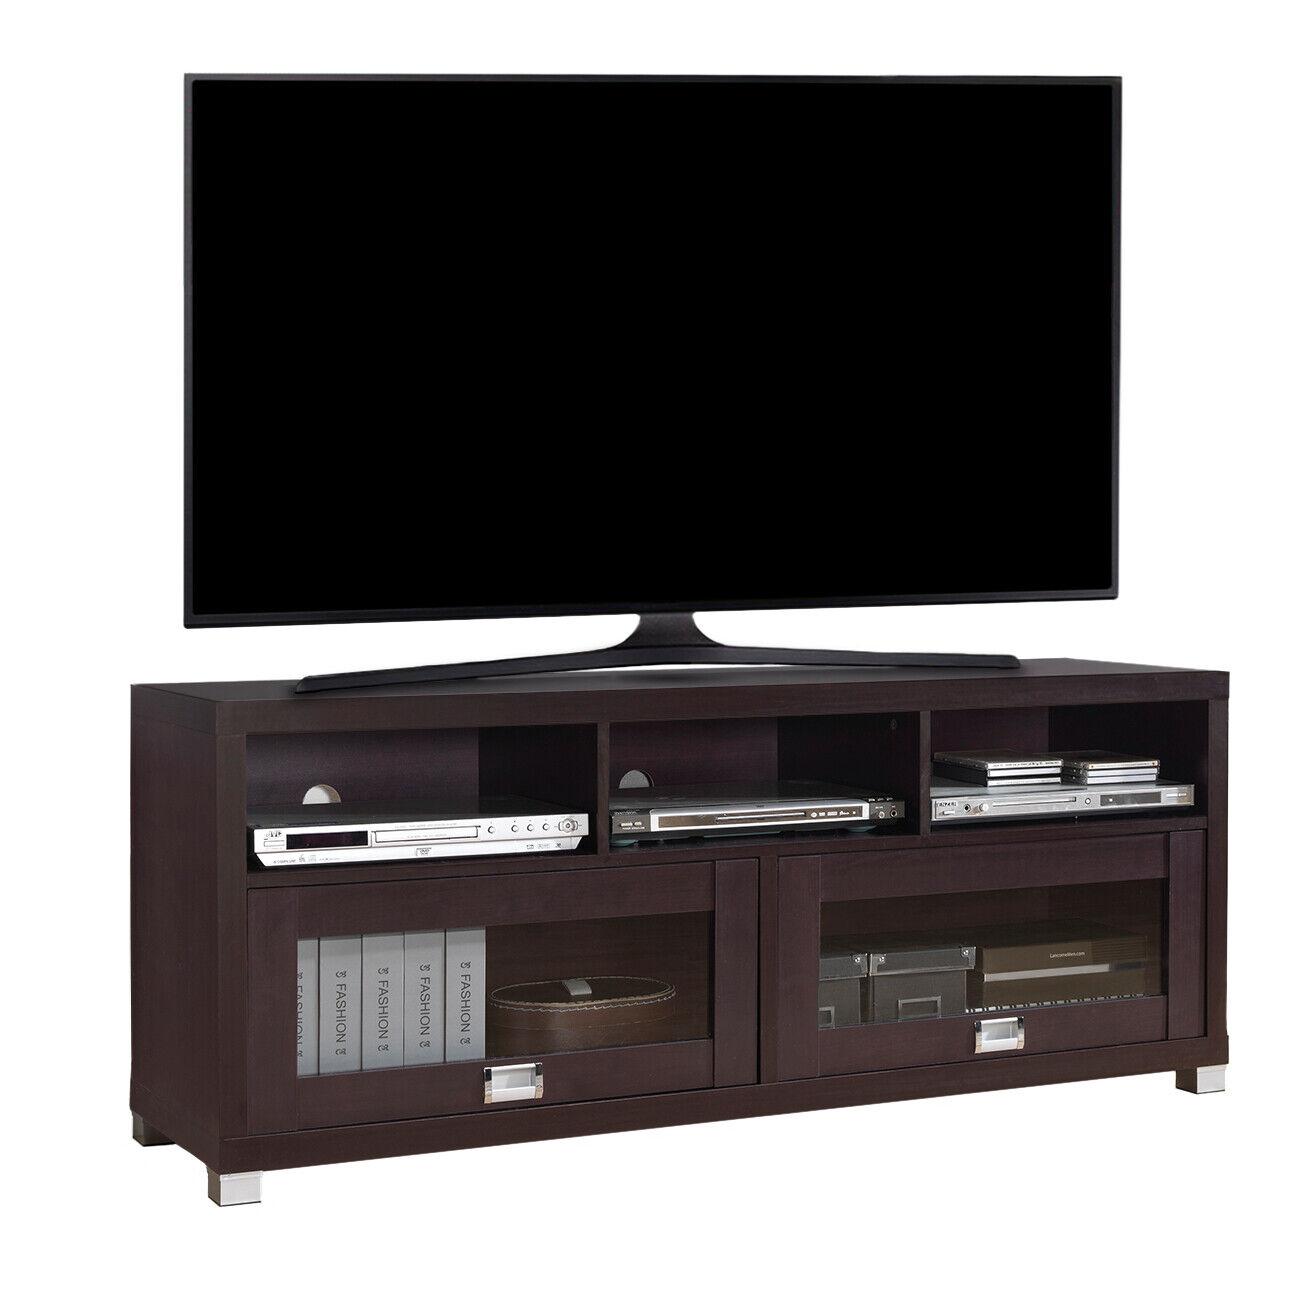 "TV Stand 65"" Flat Screen Entertainment Center Media Home Con"